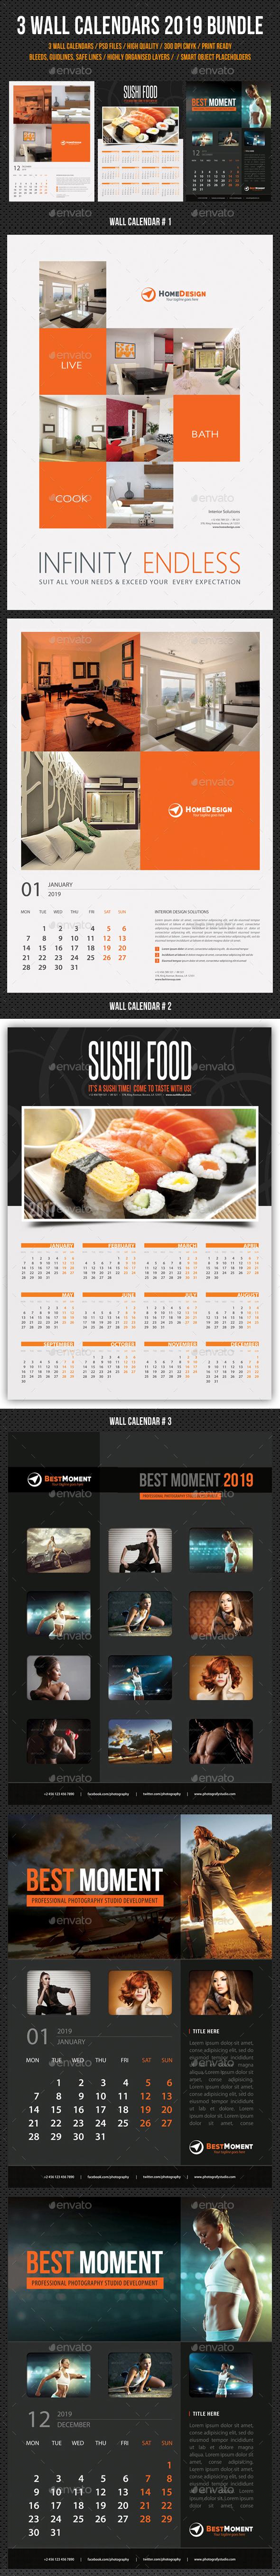 Wall Calendars 2019 Bundle V06 - Calendars Stationery